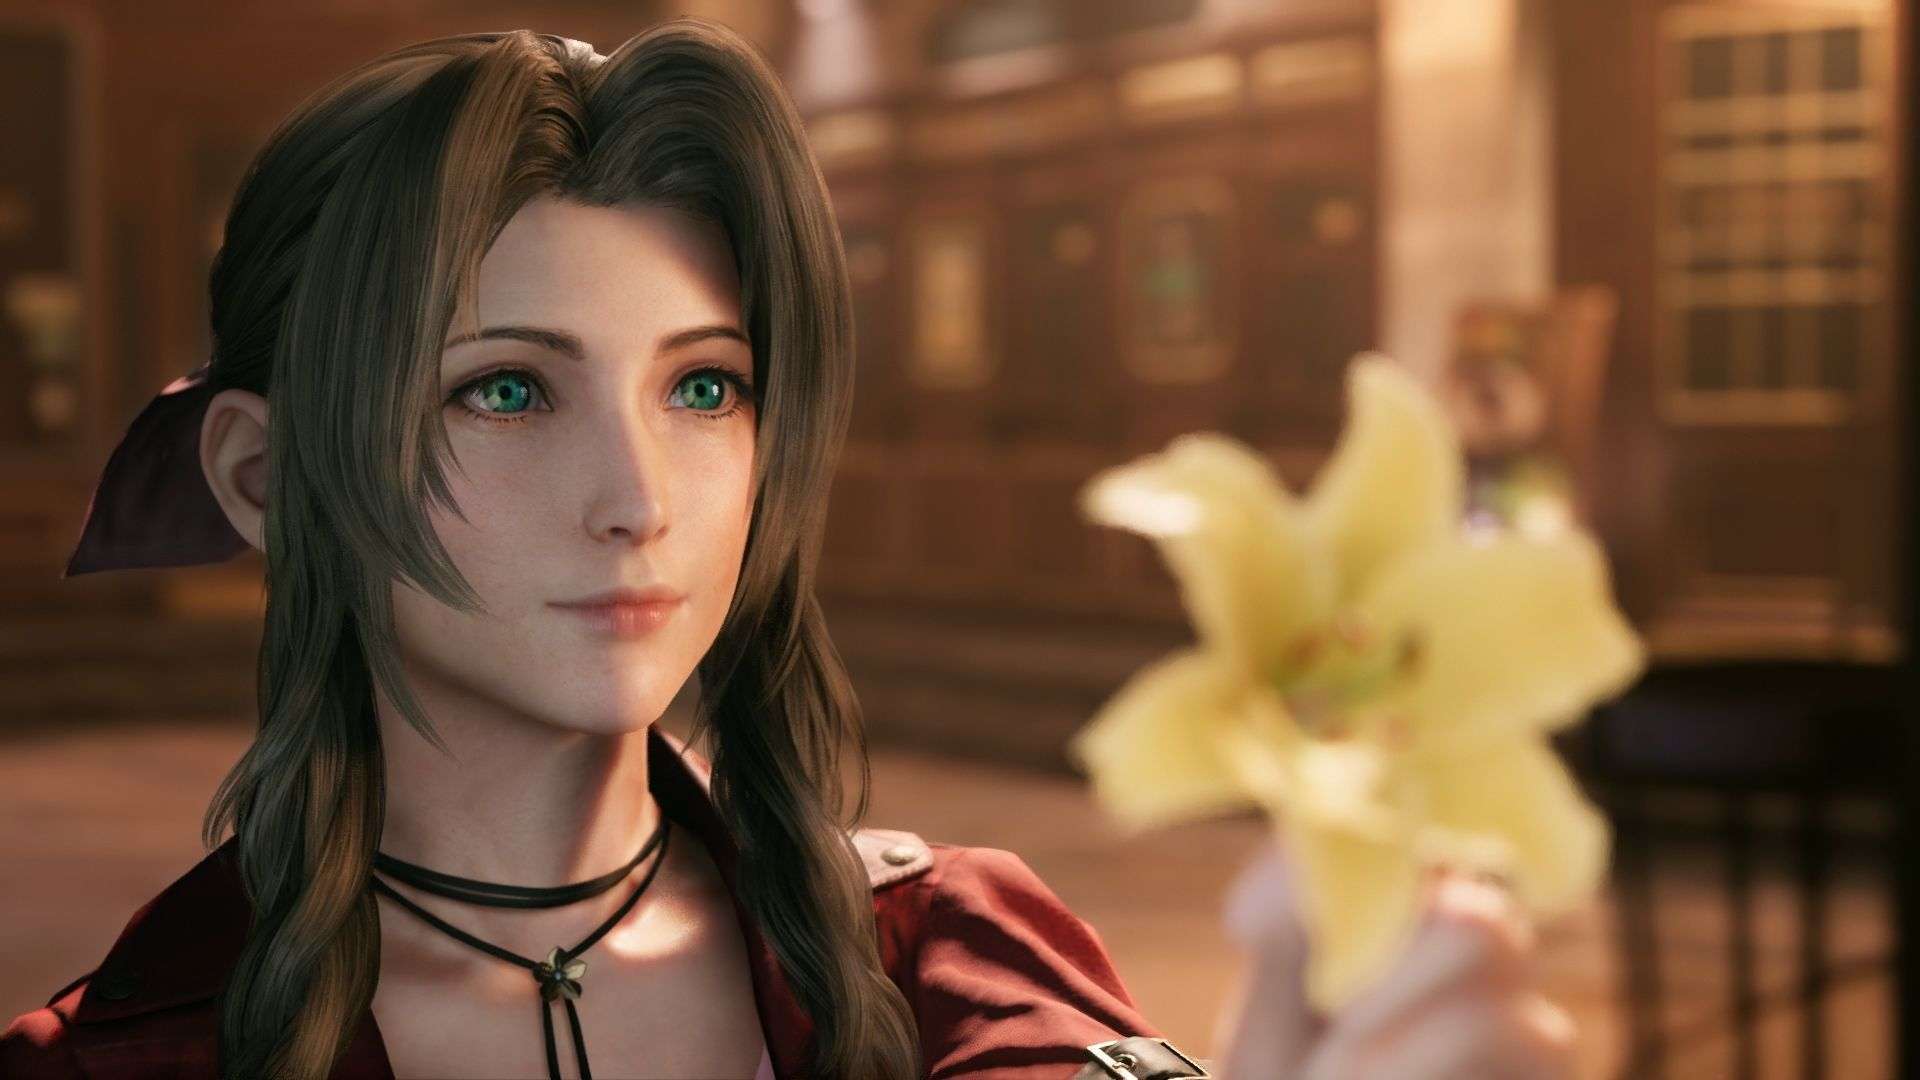 Final Fantasy VII Remake (PS4) - 4